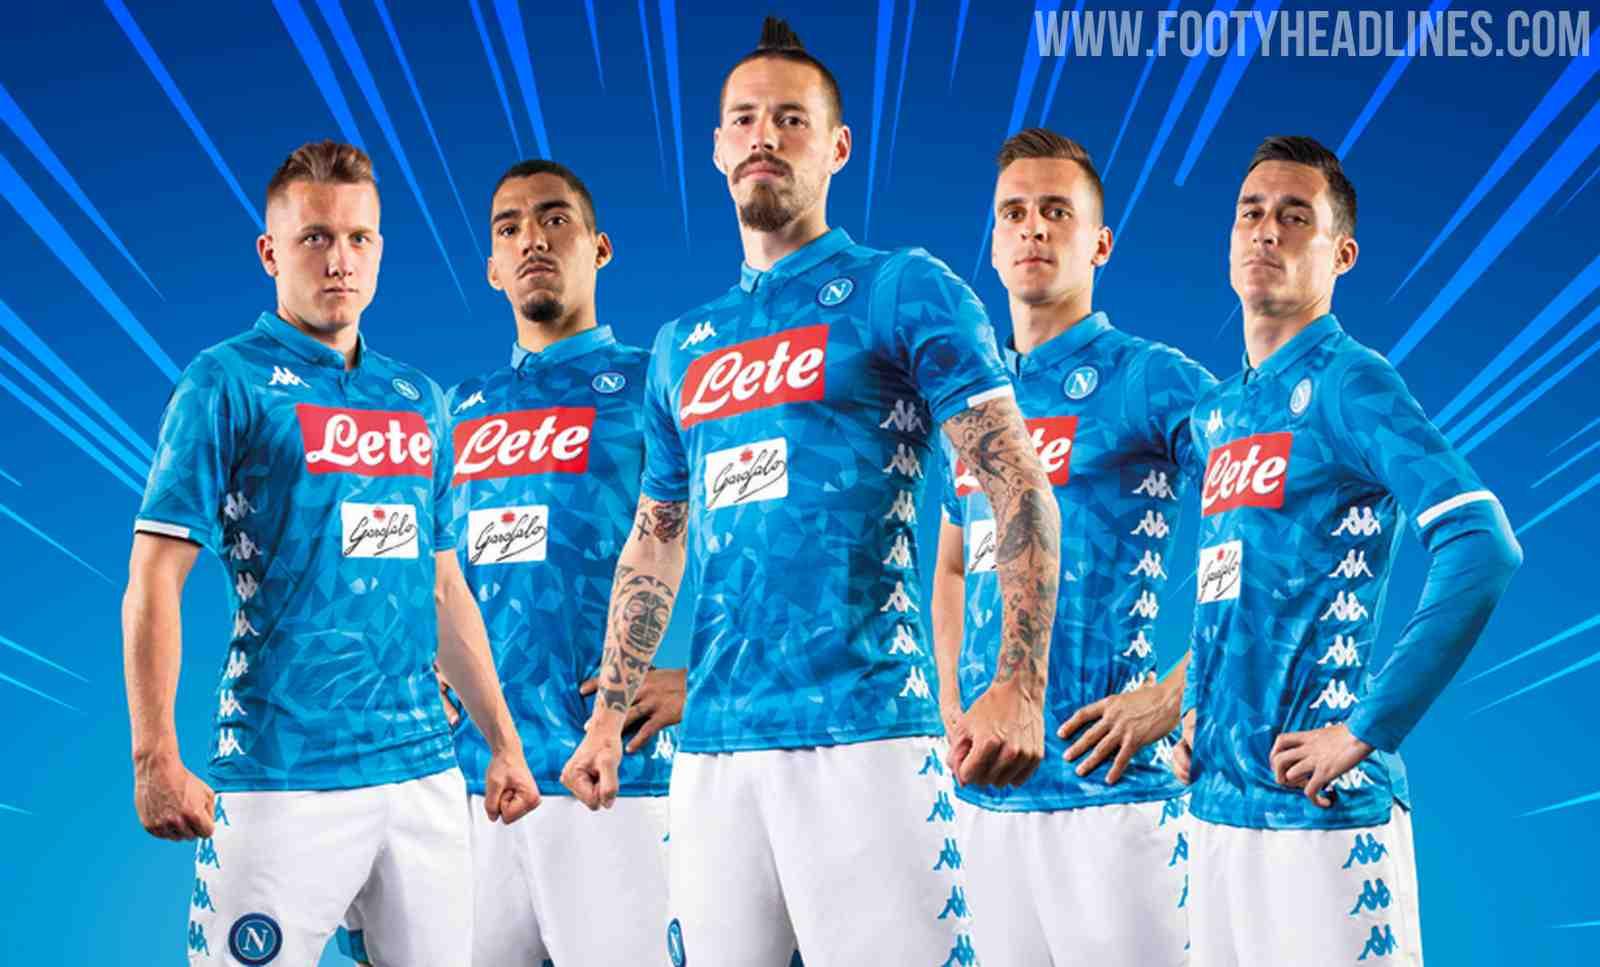 9bc7e1f88b8 Insane  Napoli 18-19 Home   Goalkeeper Kits Released - Footy Headlines